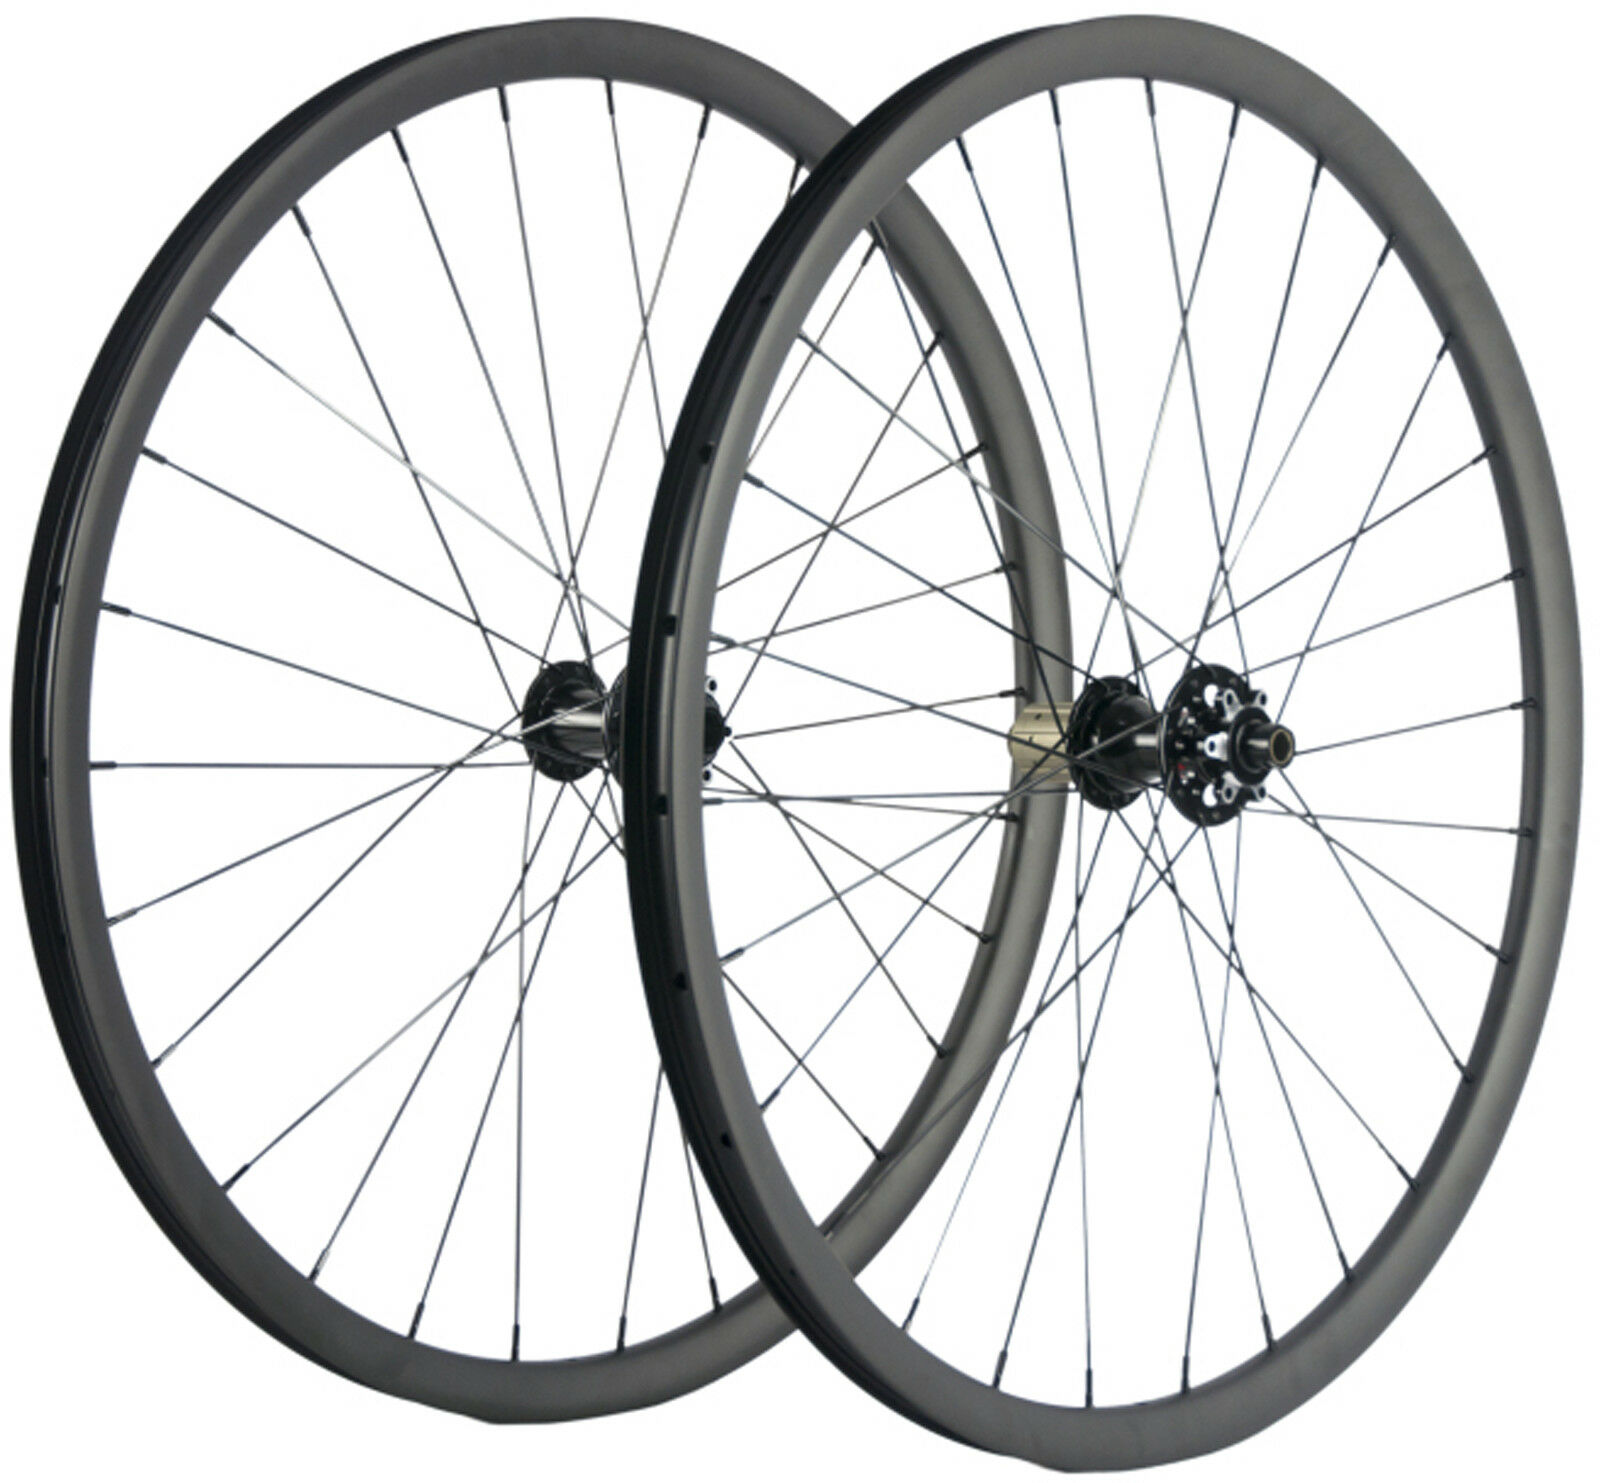 MTB Carbon Wheels Wheelset 27.5ER 27mm Width Tubeless Mountain Bike 700C XC